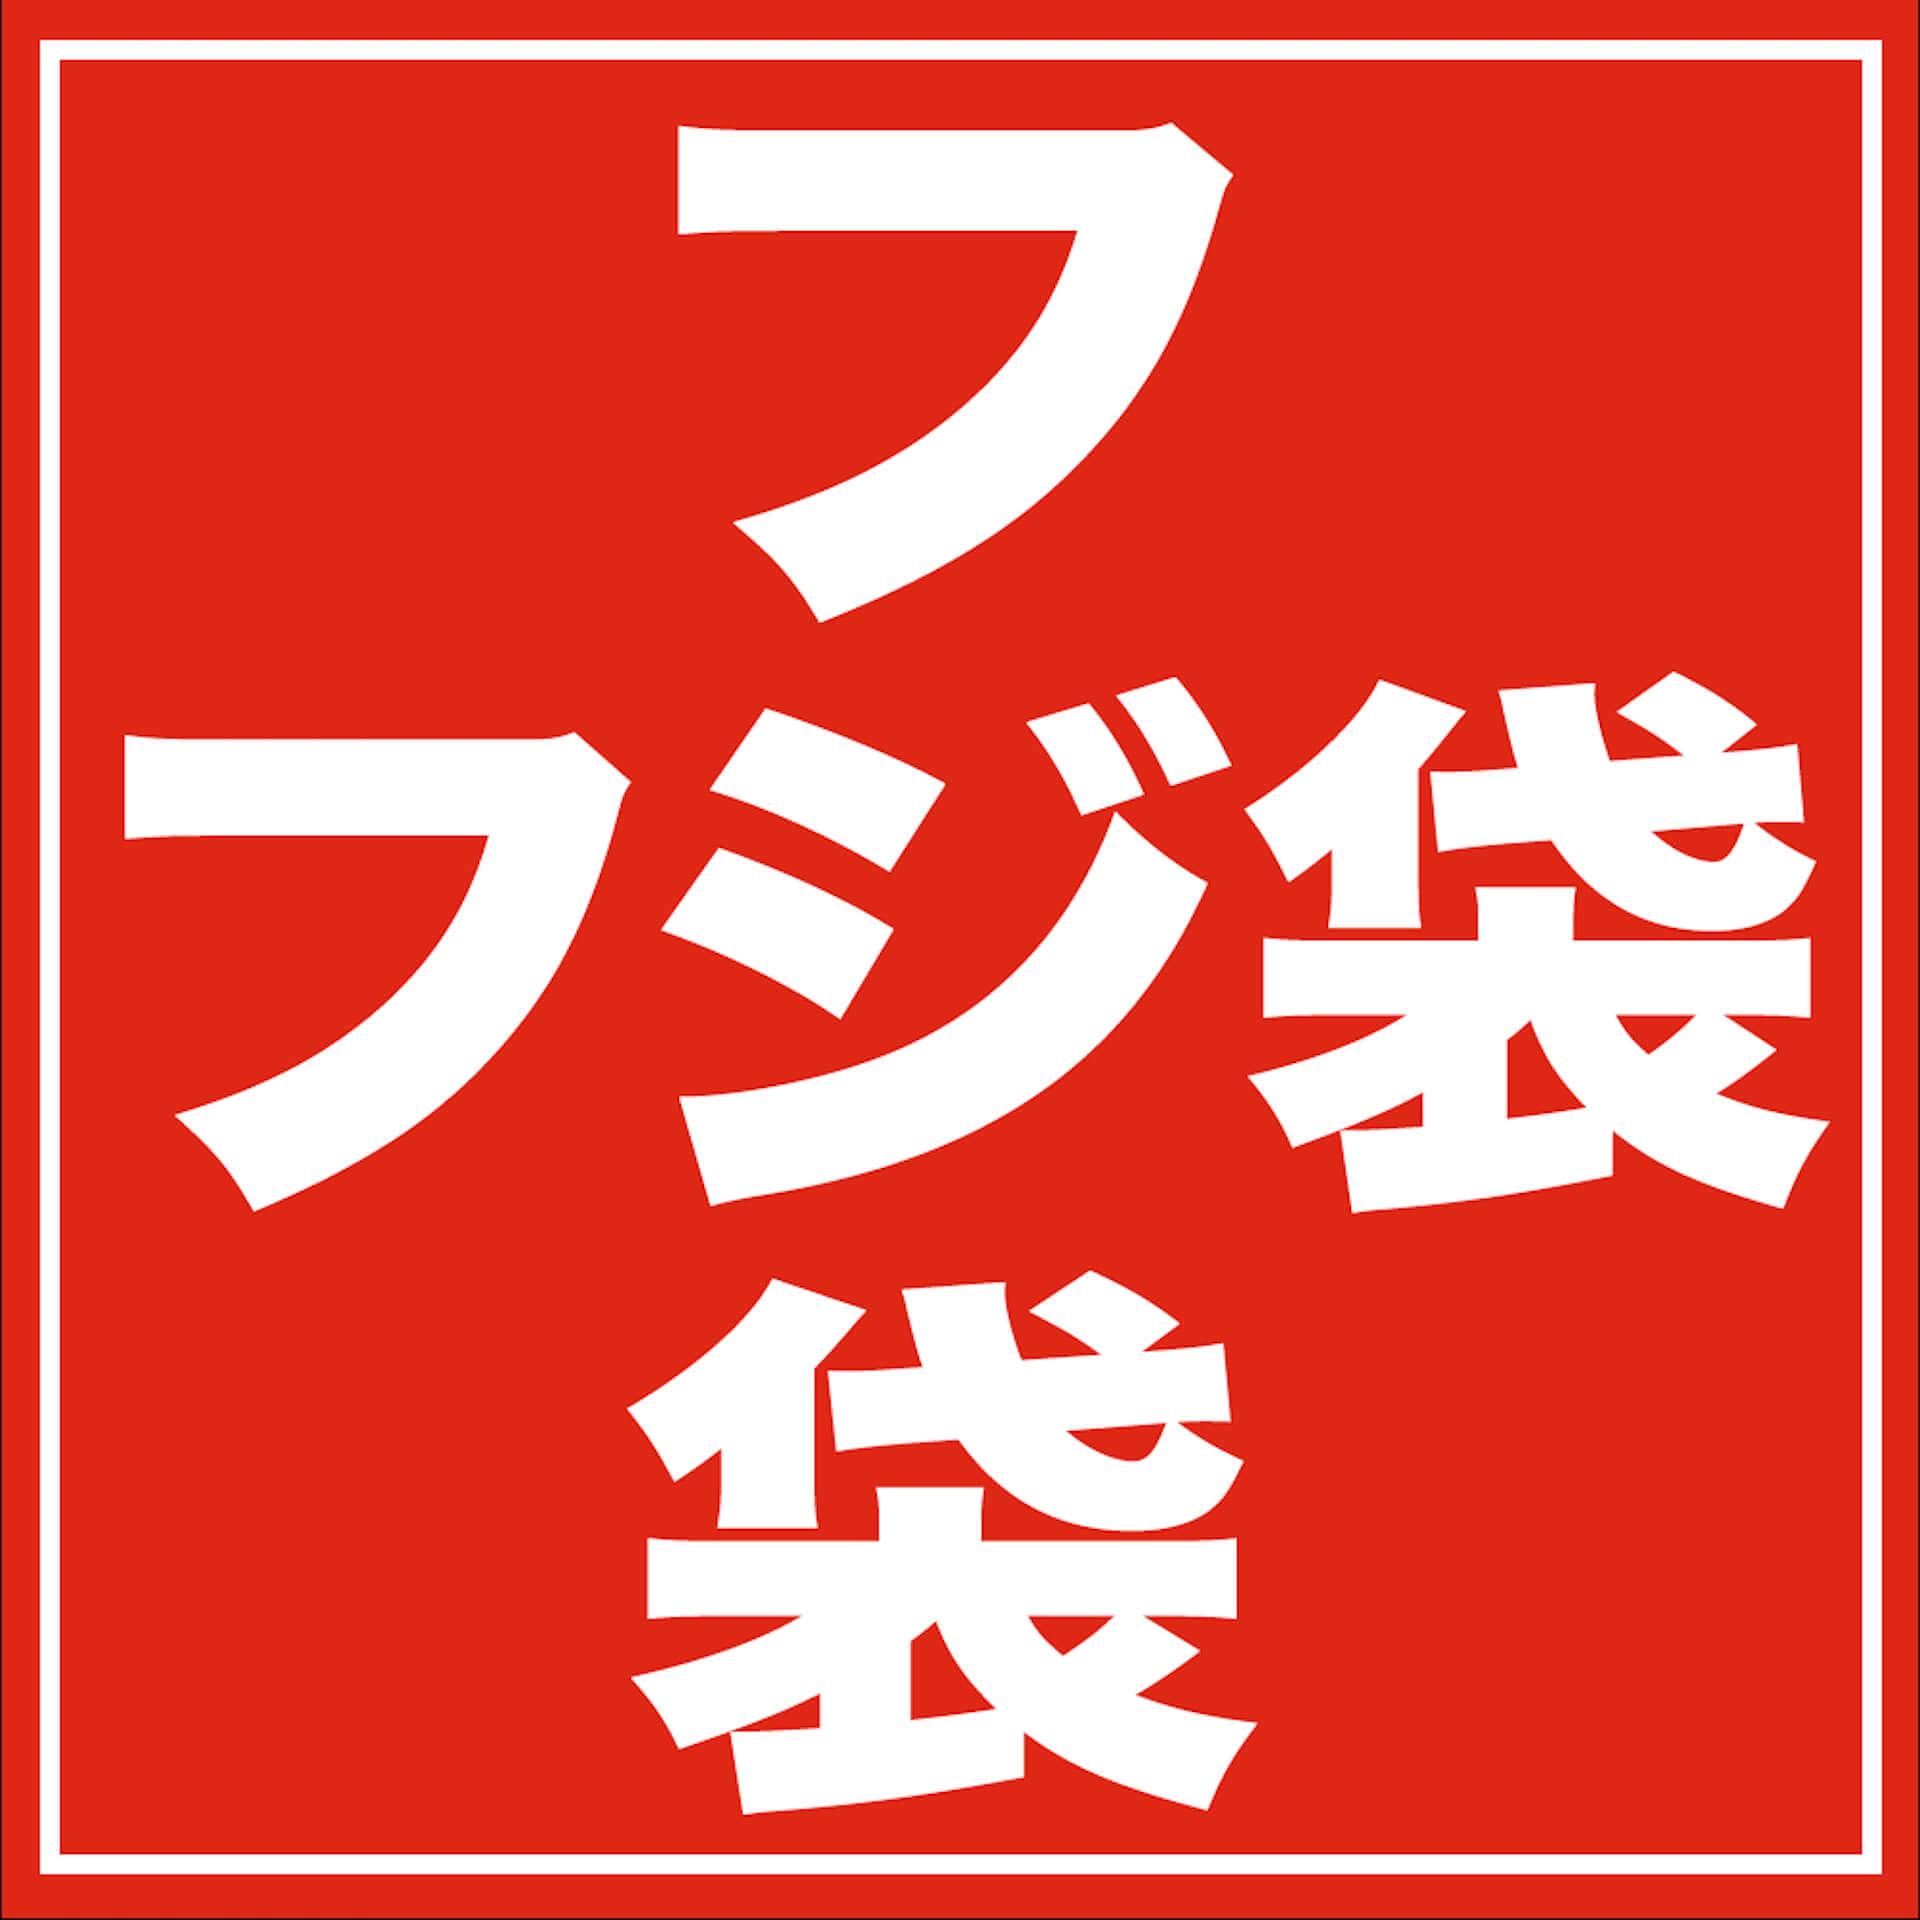 <FUJI ROCK FESTIVAL>公式グッズの新作が登場!大晦日イベント<KEEP ON FUJI ROCKIN' II>のチケットも明日発売 musicf201211_frf_2-1920x1920